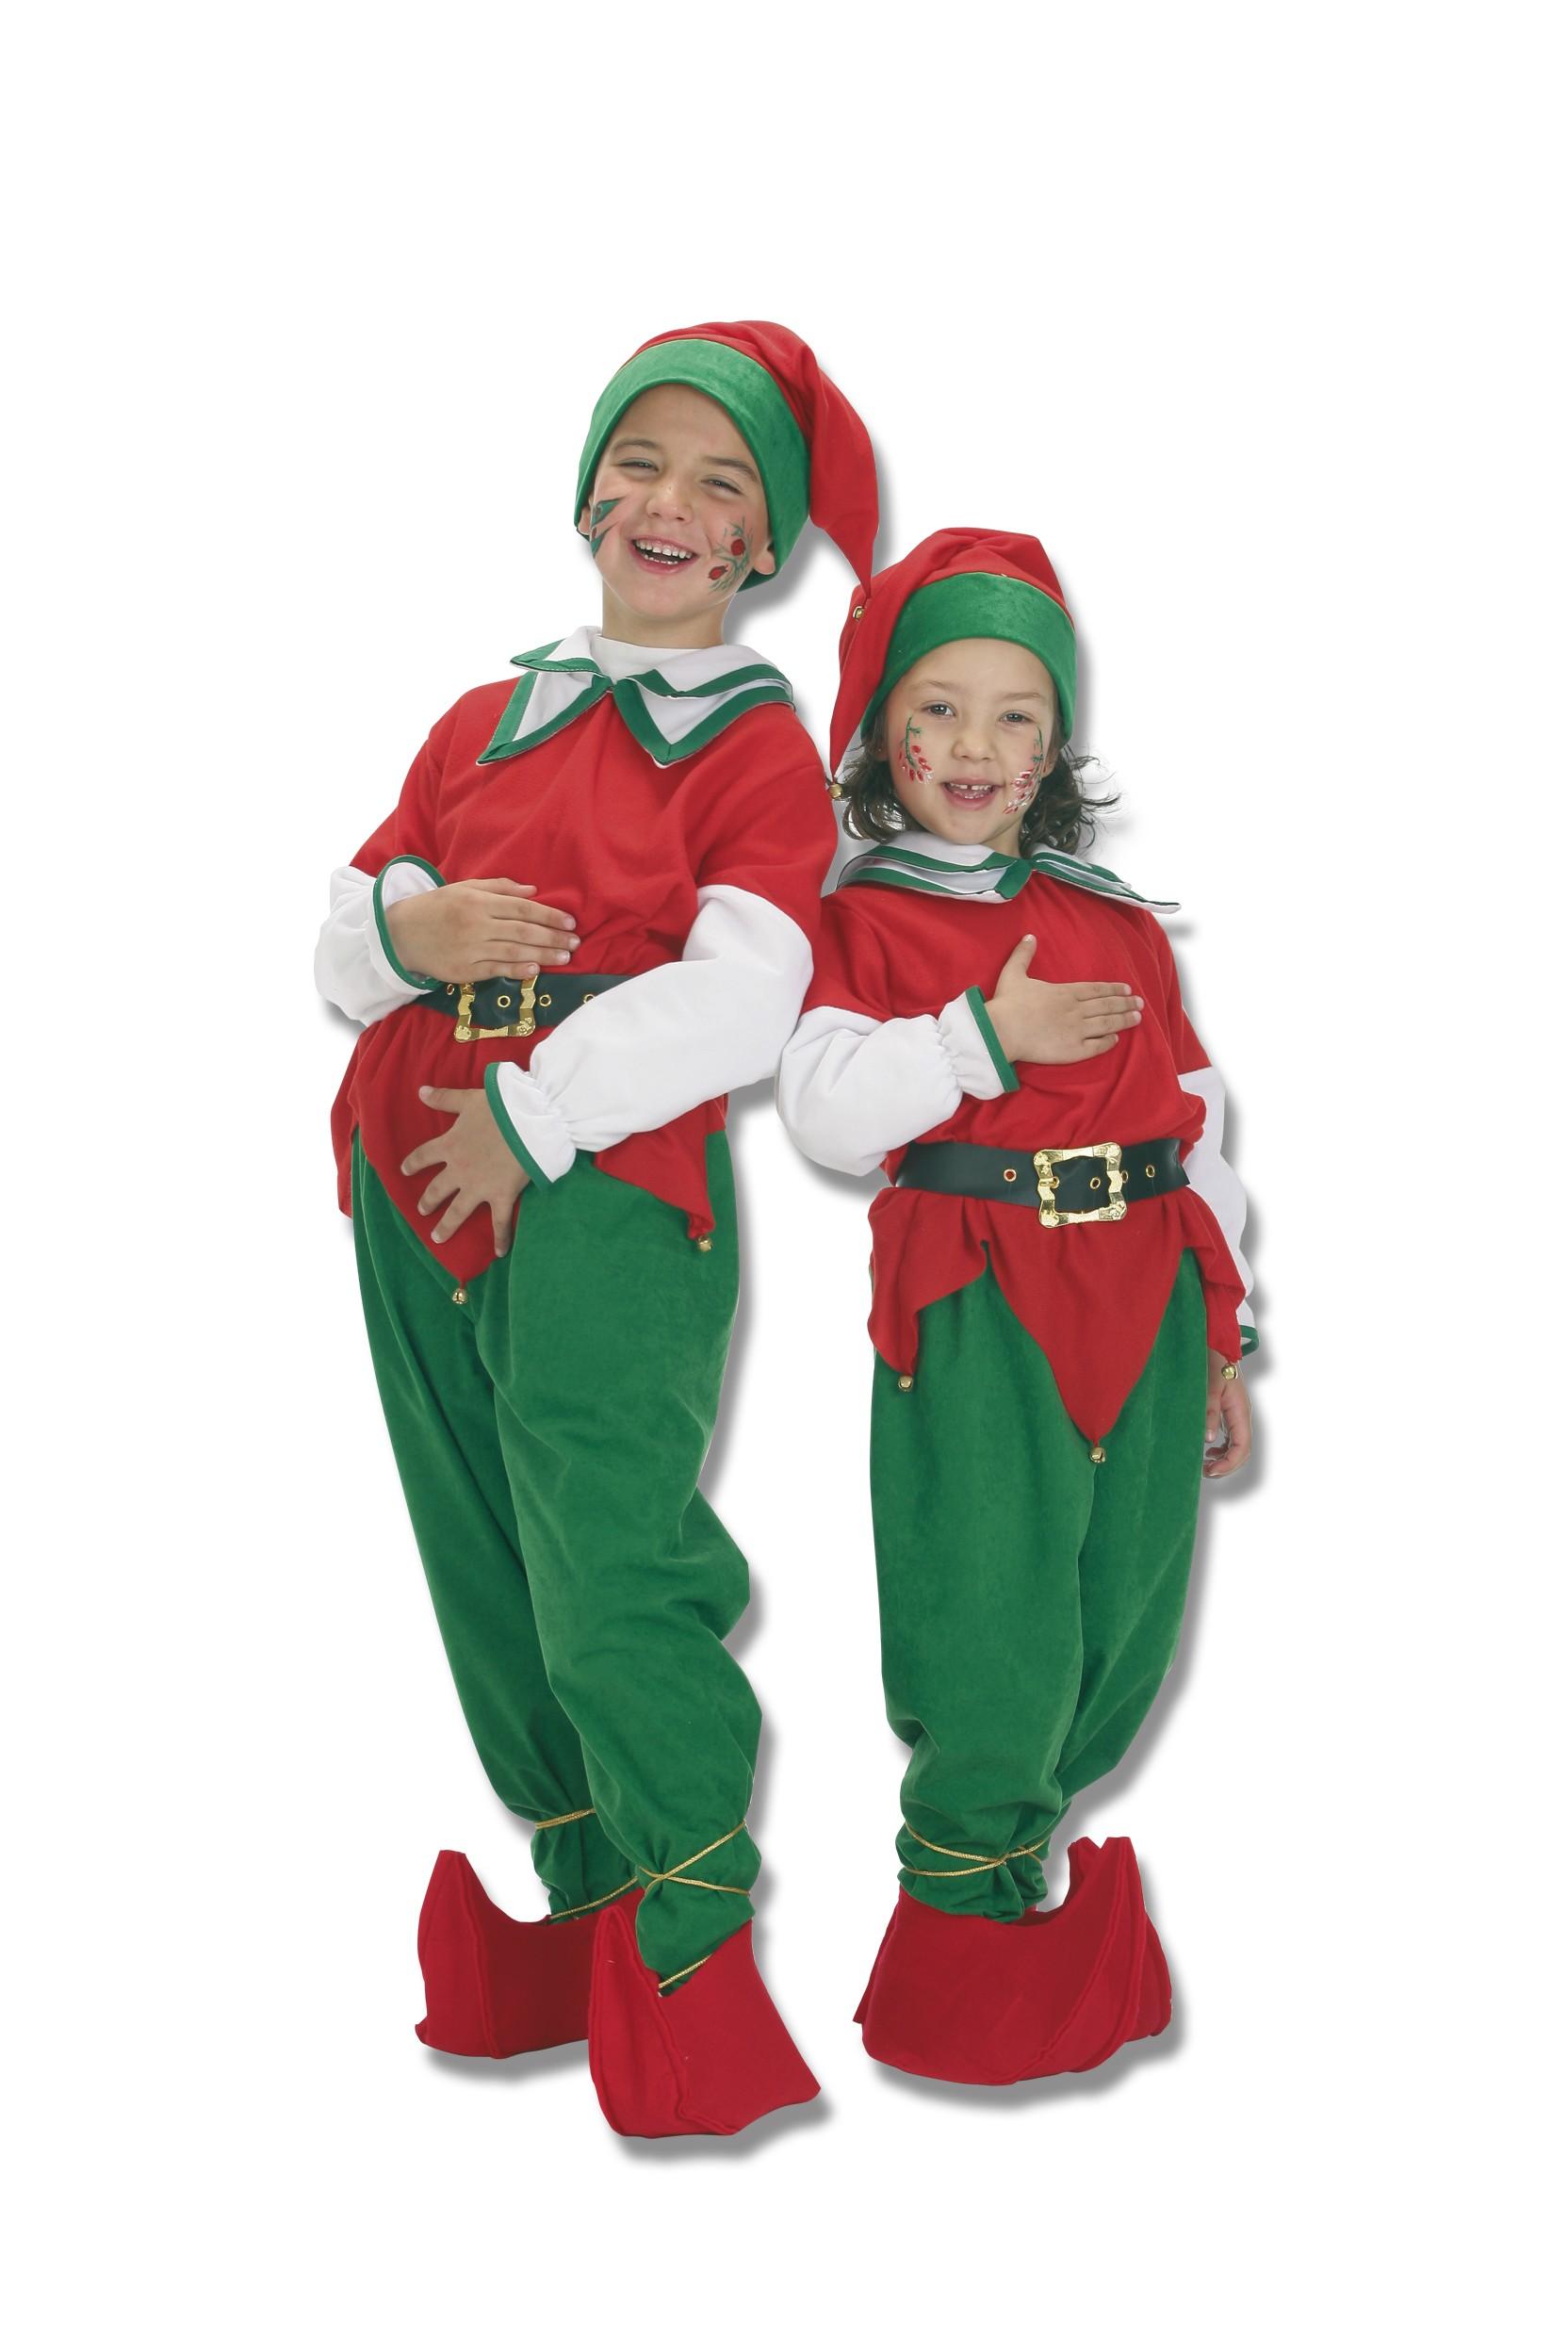 Trajes de duendes navide os - Disfraces de duendes navidenos para ninos ...